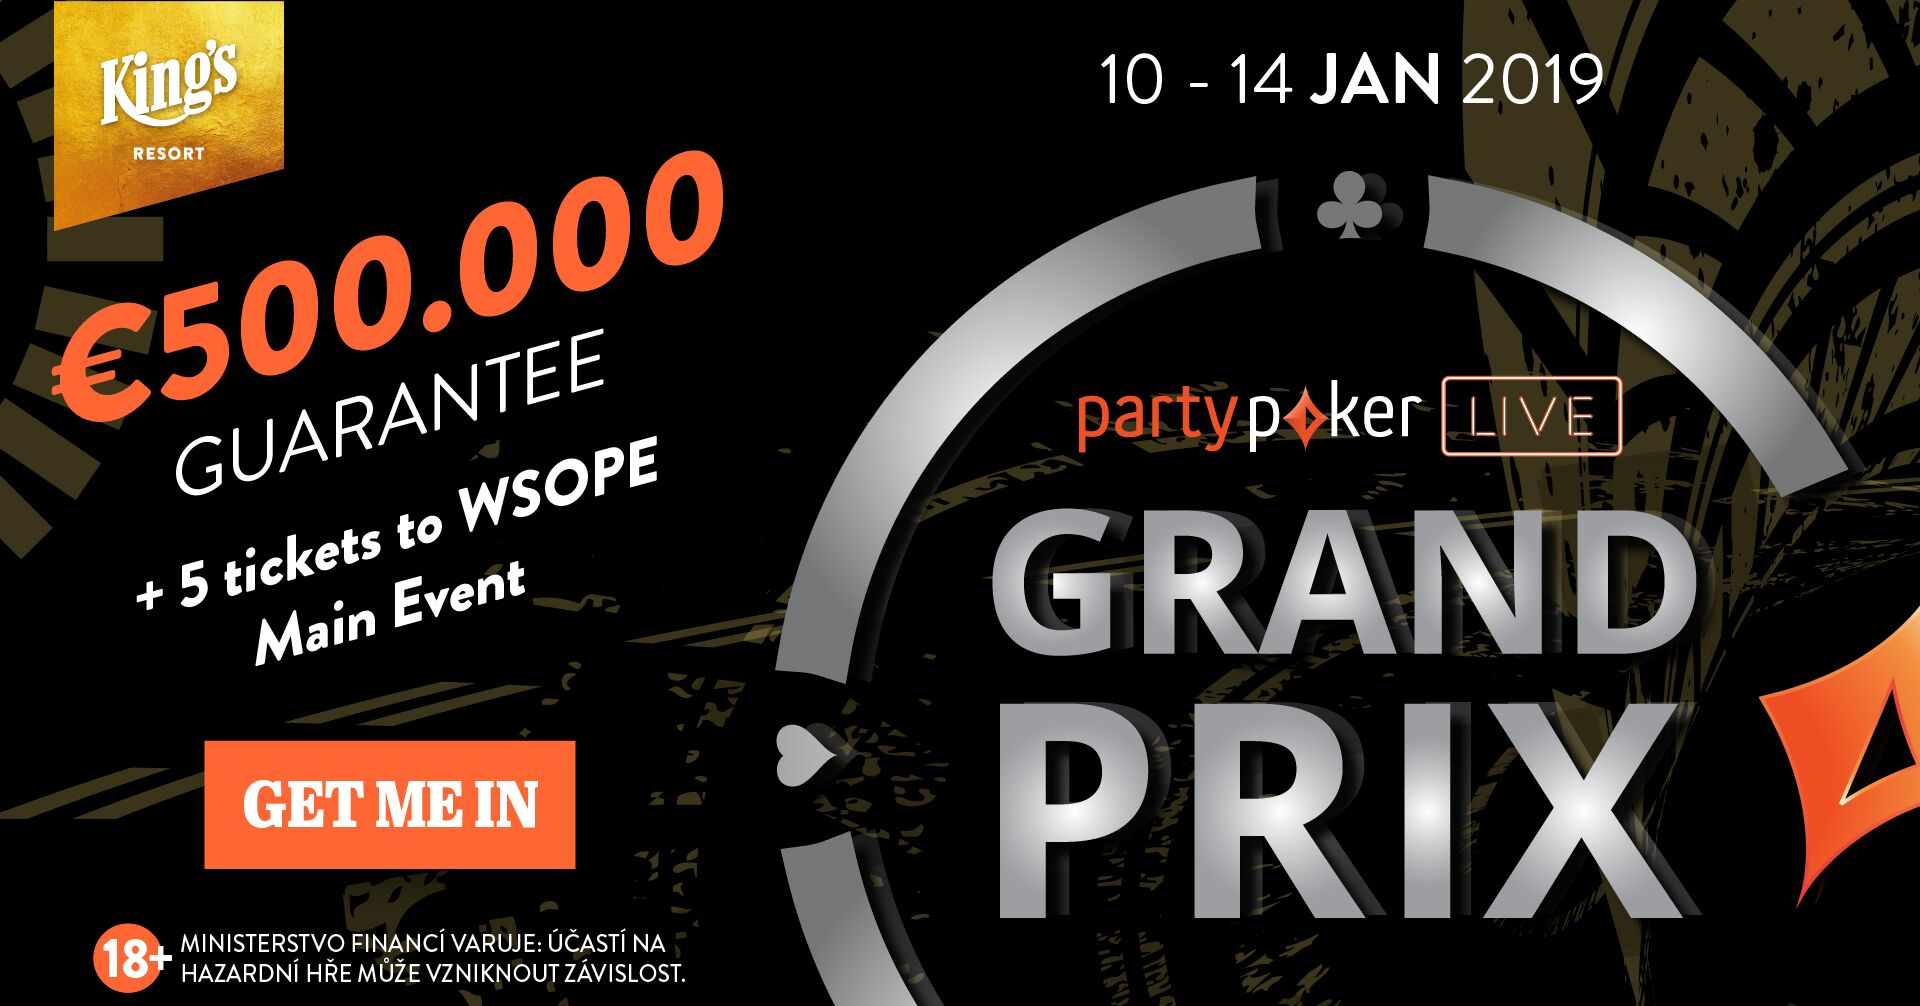 PartyPoker Grand Prix sgarancí €551,750